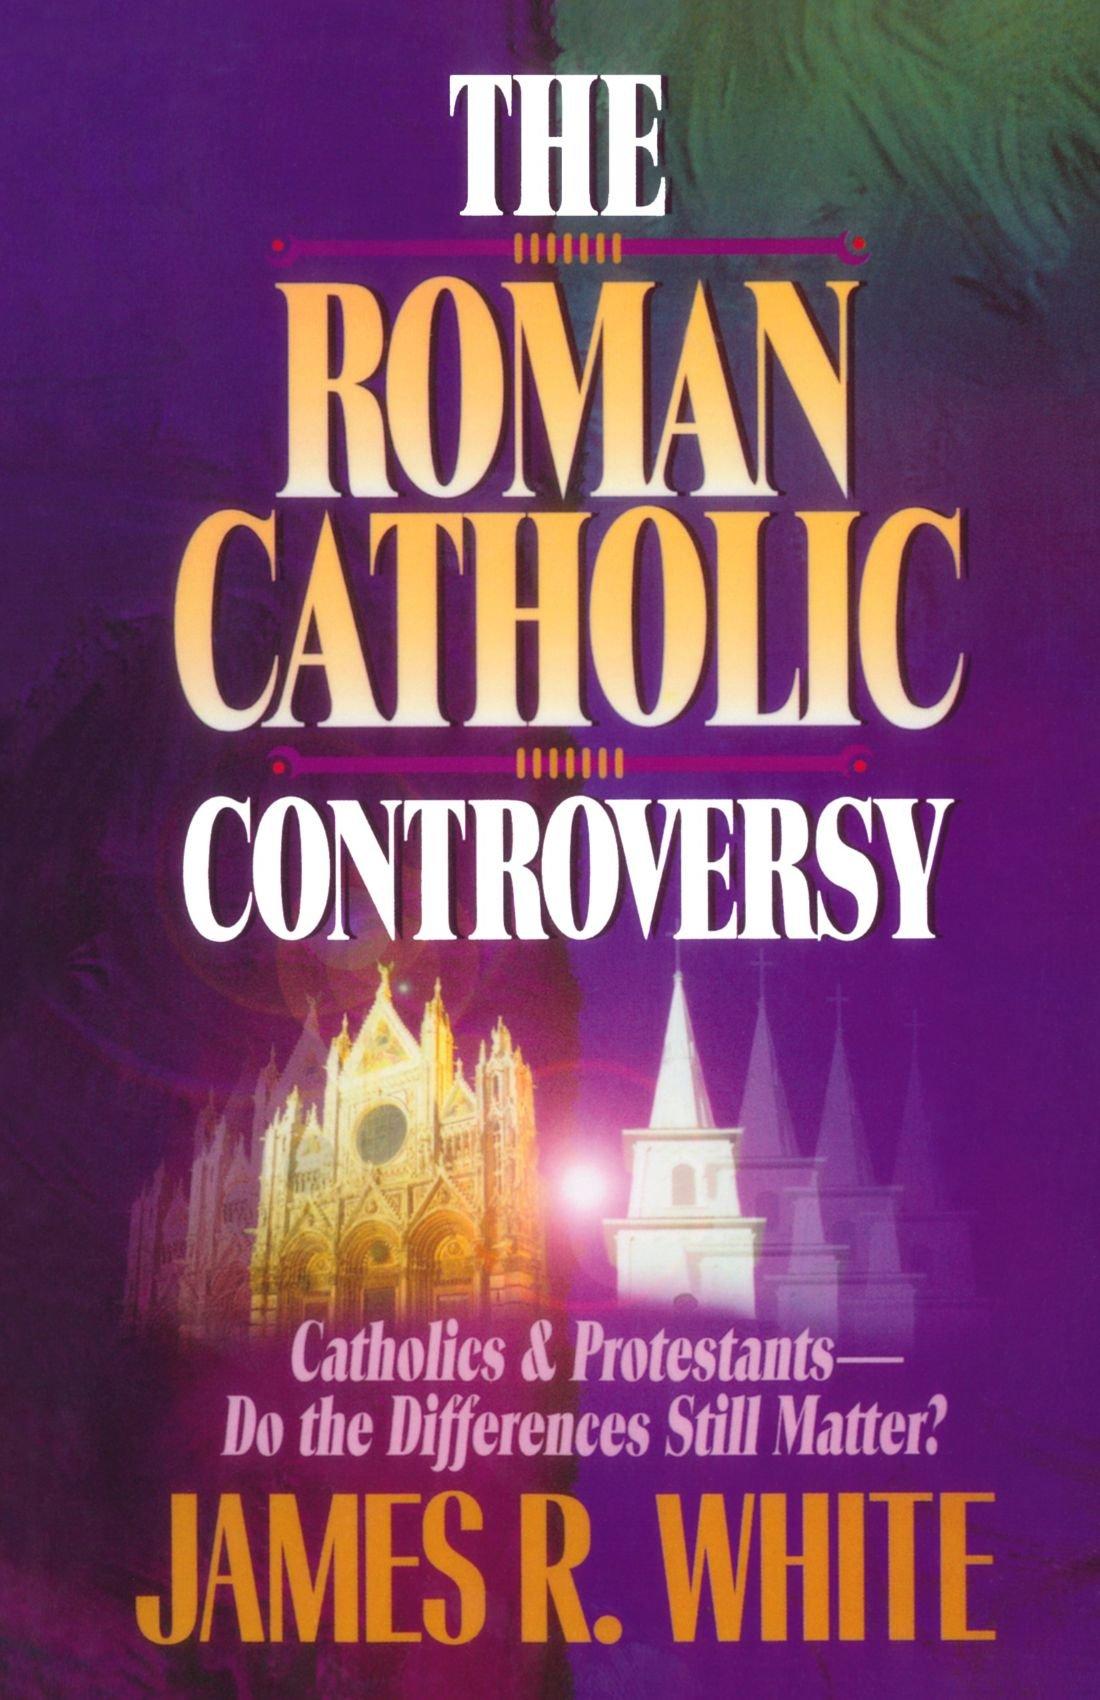 amazon the roman catholic controversy james r white christianity